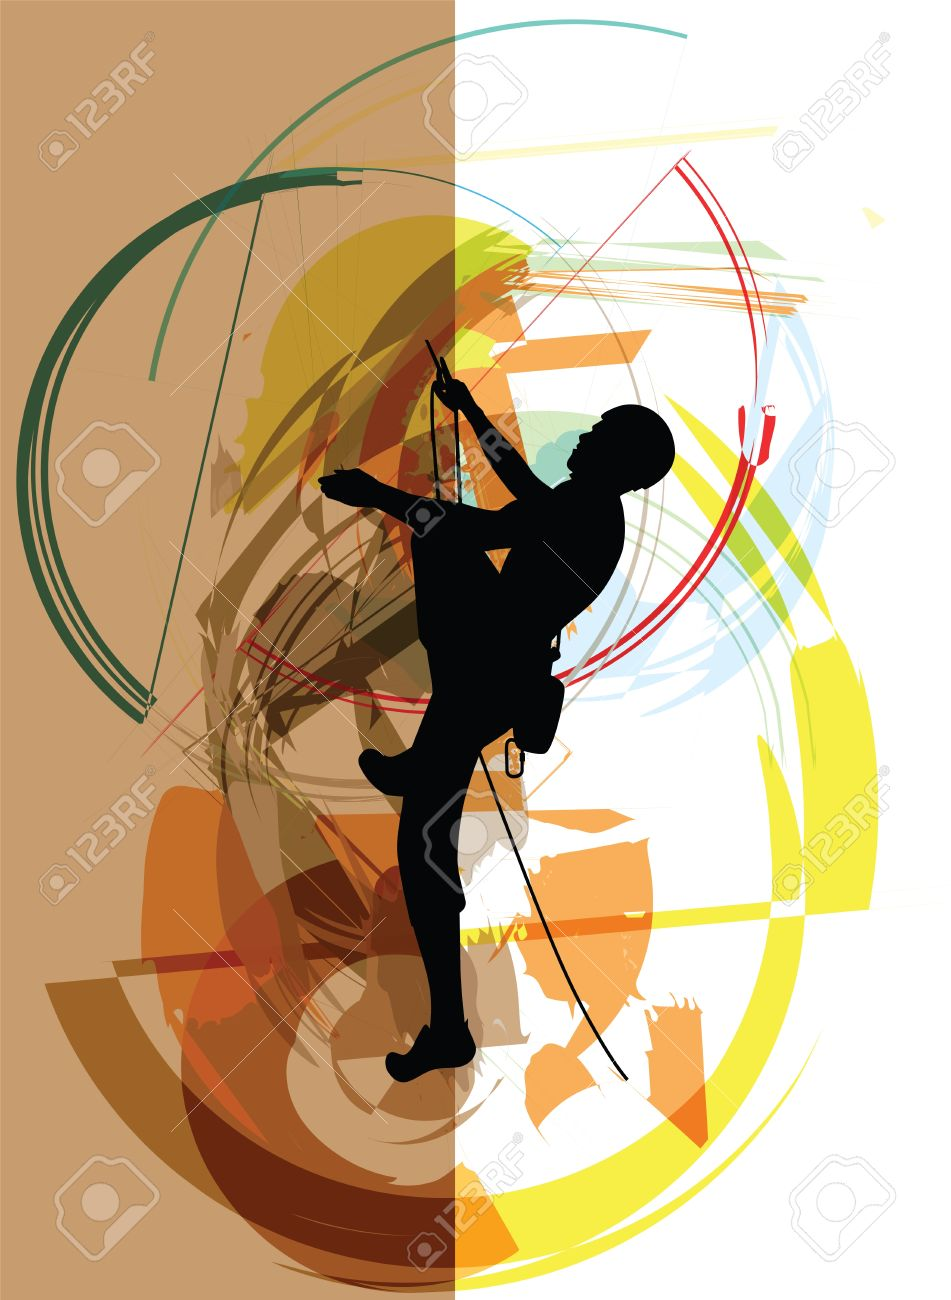 Sketch of rock climber illustration - 14840668